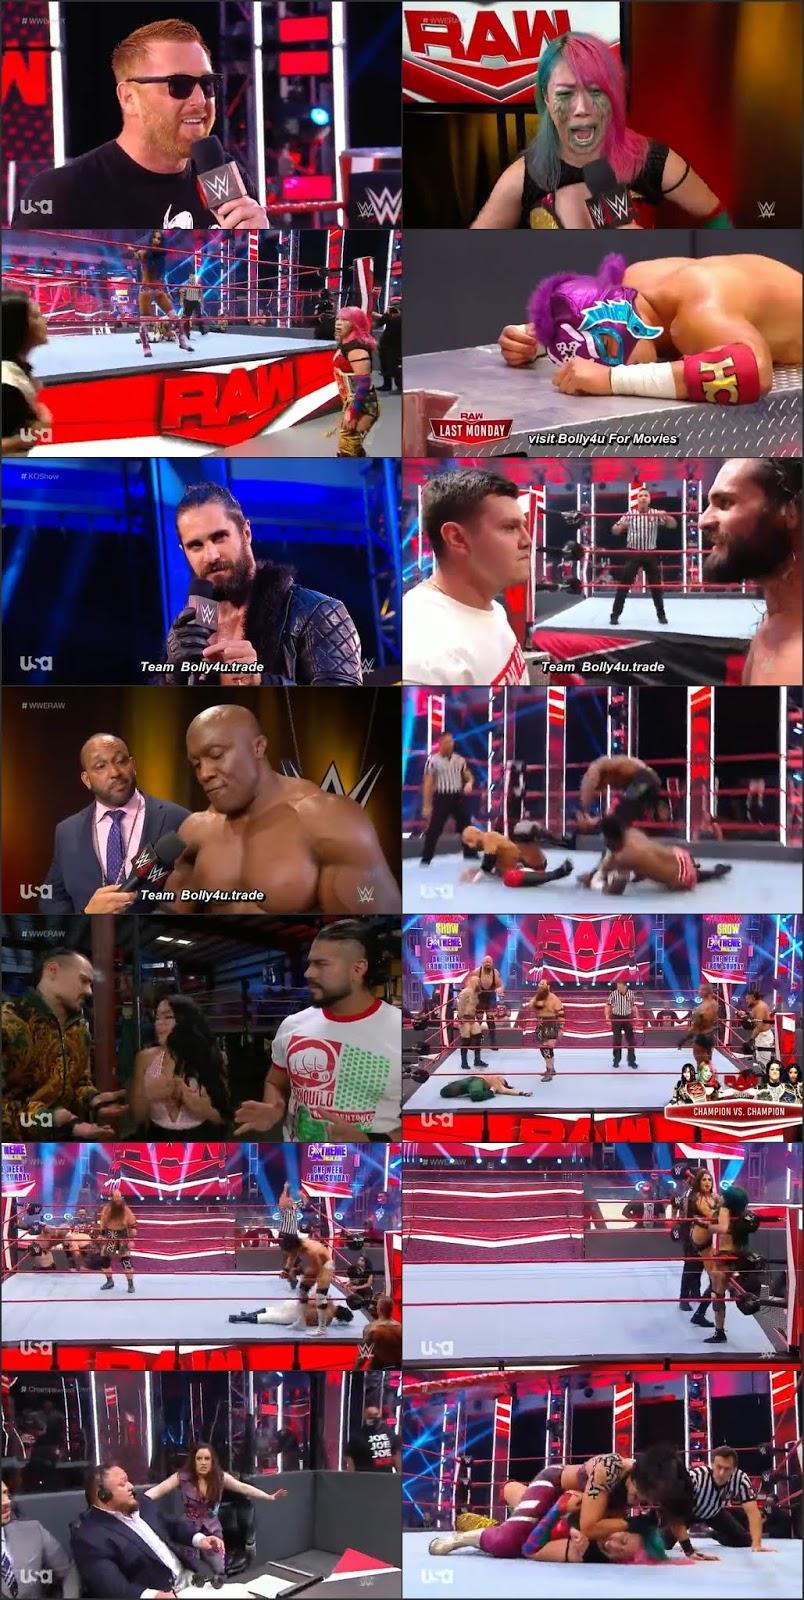 WWE Monday Night Raw HDTV 480p 350Mb 06 July 2020 Download